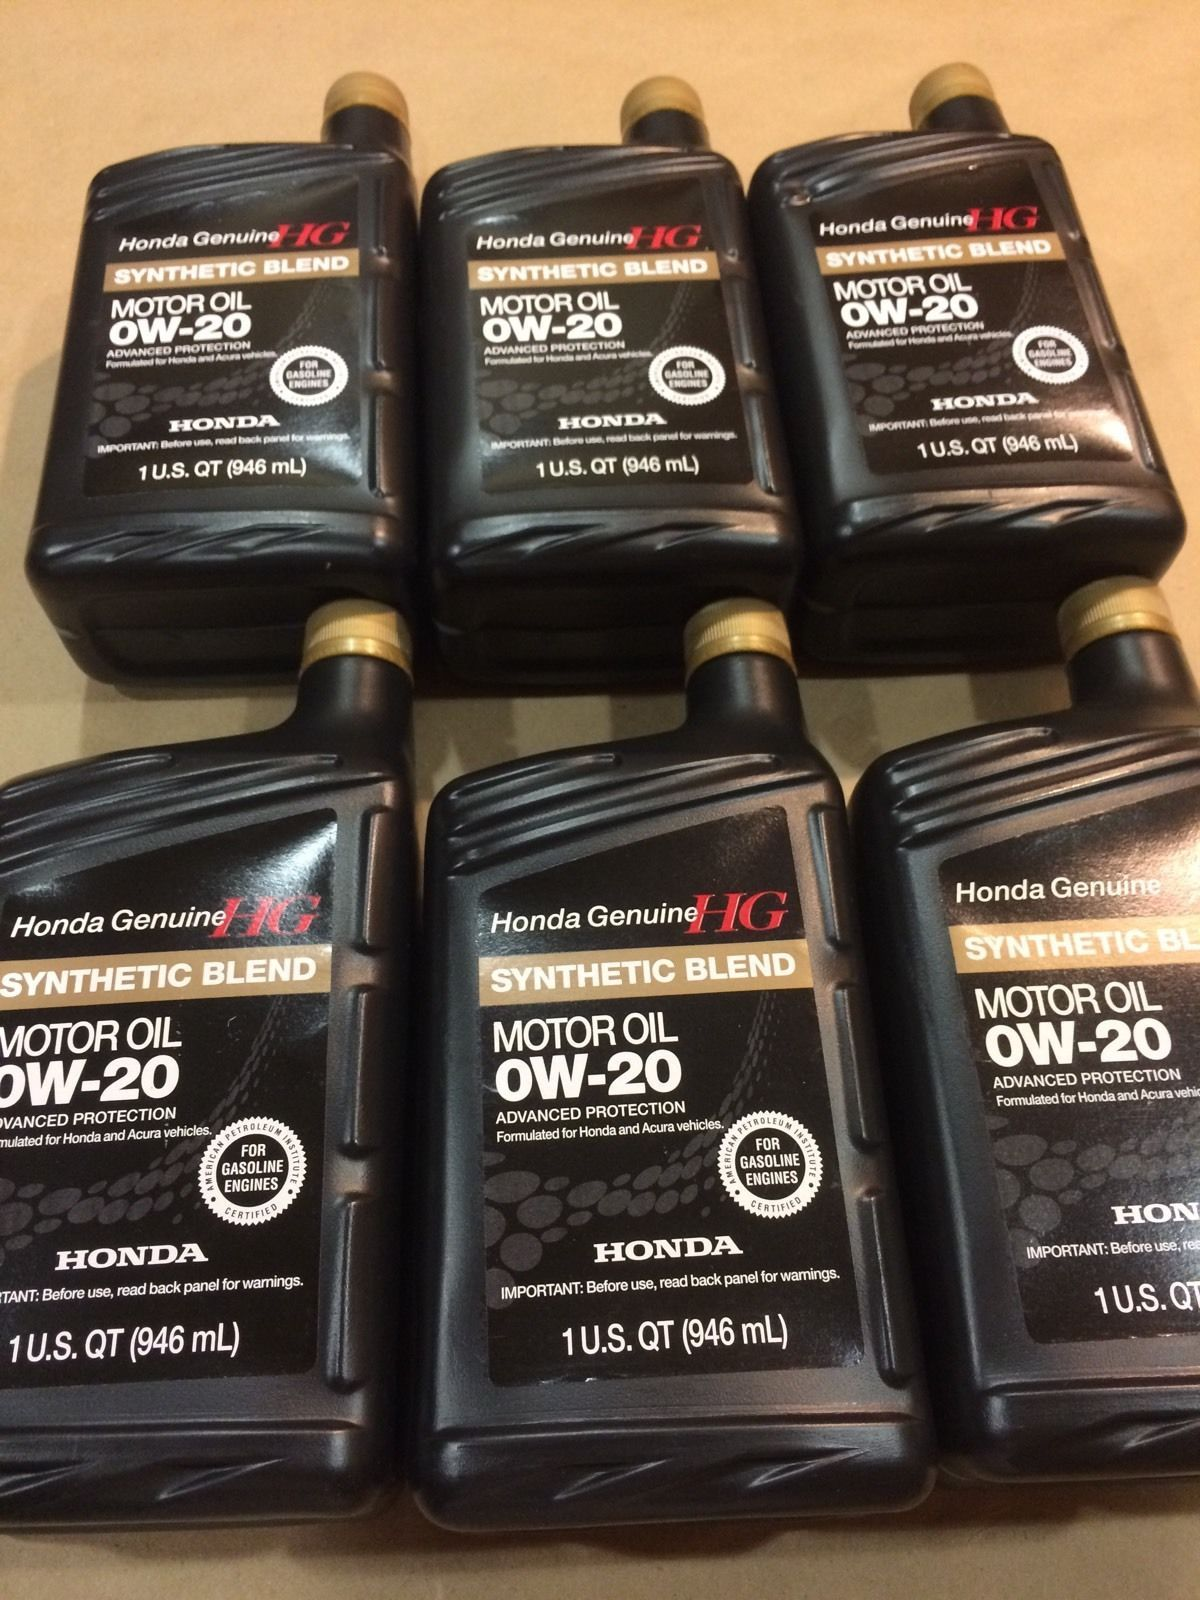 Honda Genuine Sae 0w20 Synthetic Blend Motor Oil A Set Of 6 Motor Oil Oils Oil Sets